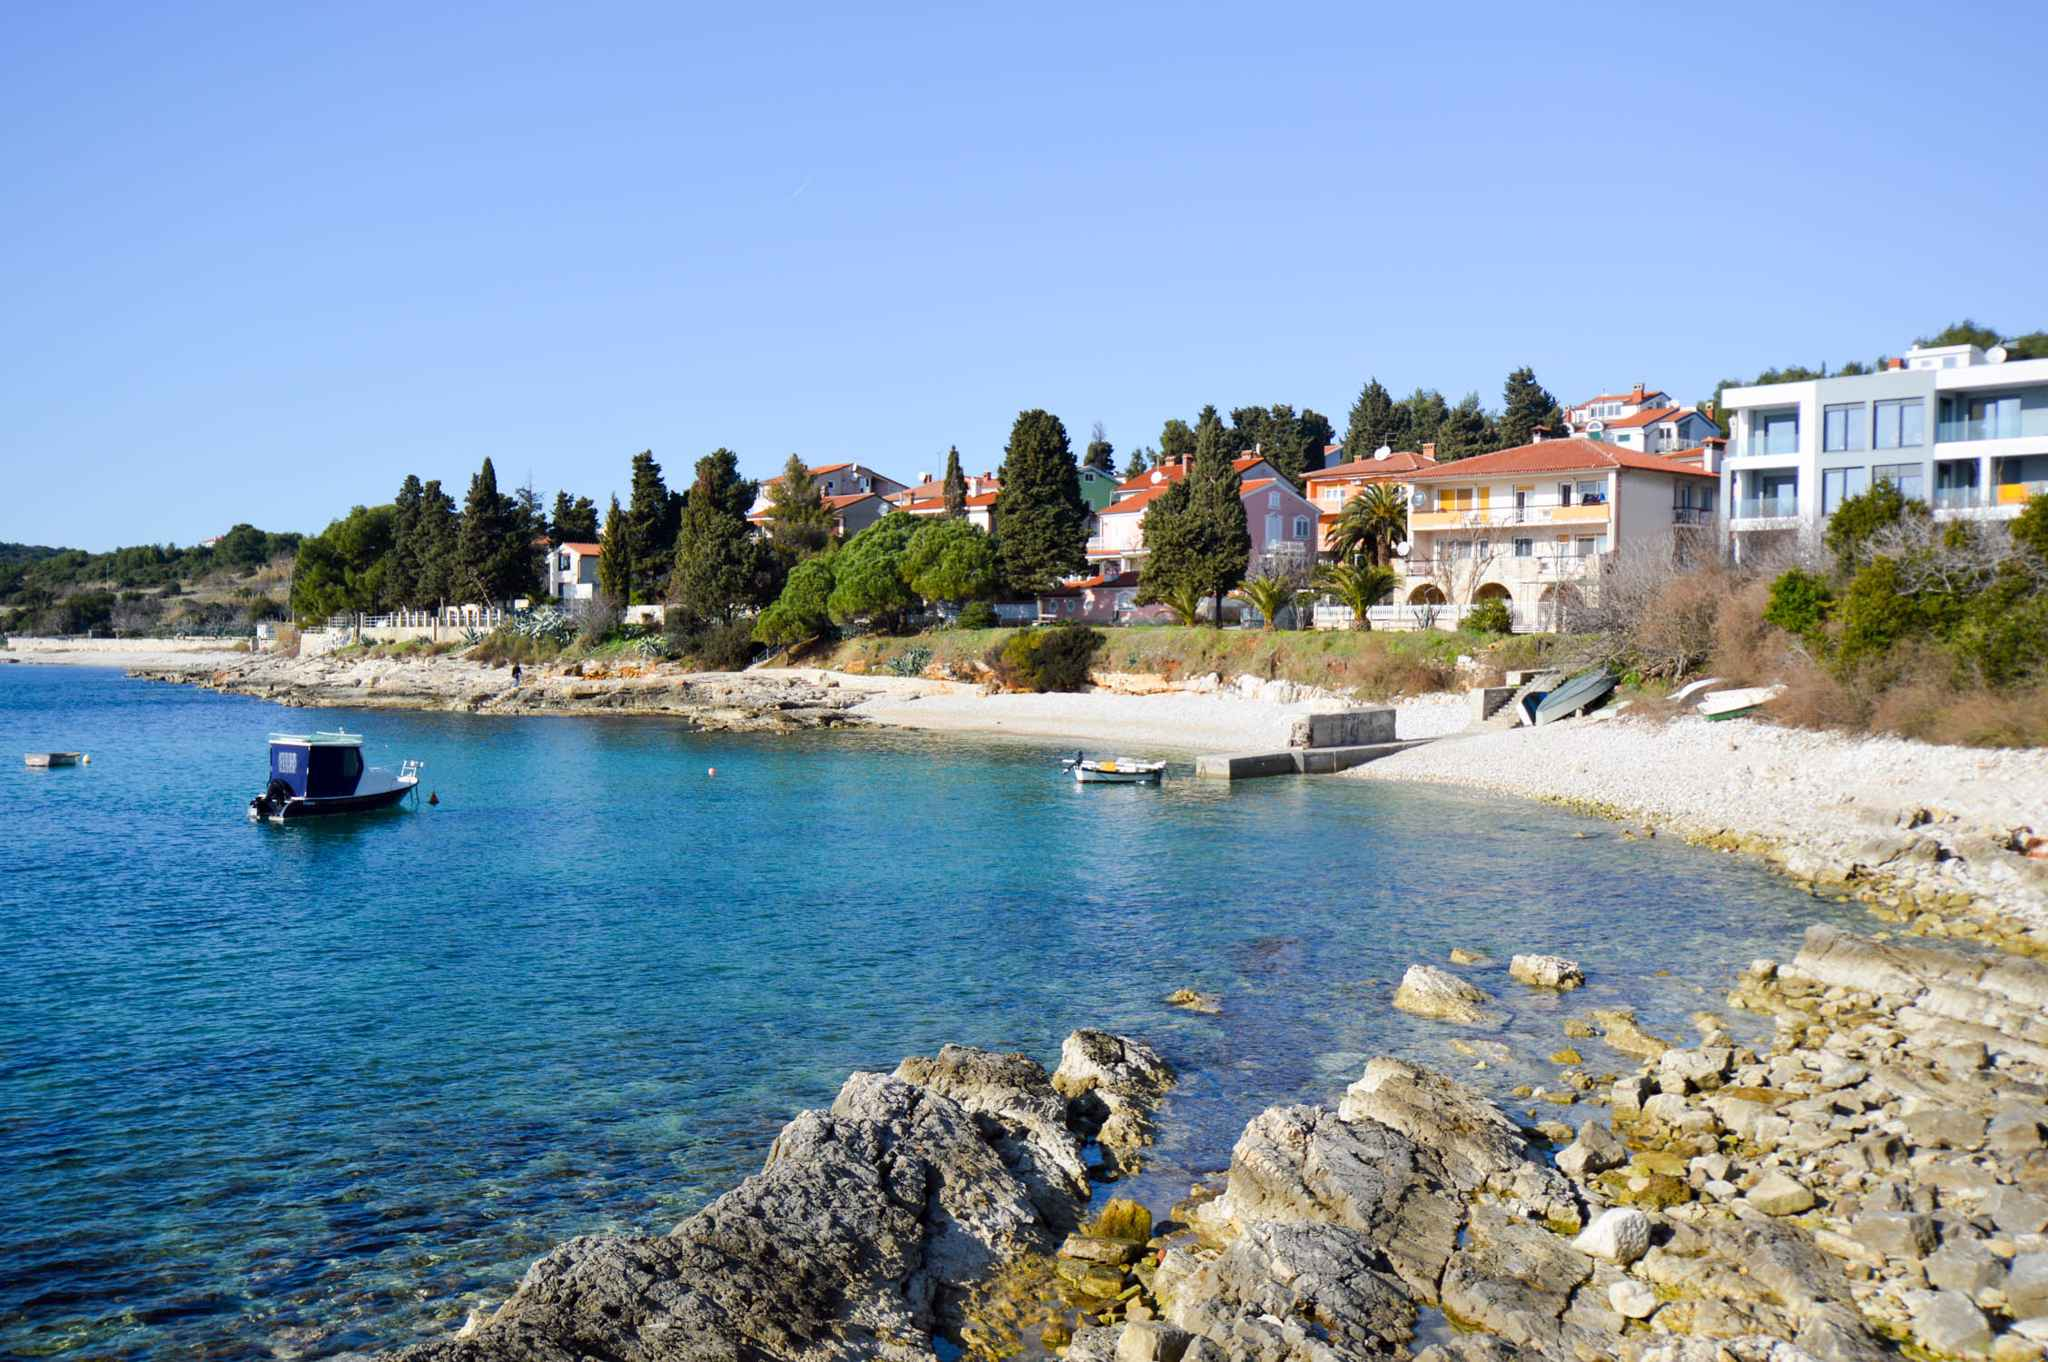 Ferienwohnung direkt am Meer gelegen (280674), Pula, , Istrien, Kroatien, Bild 1